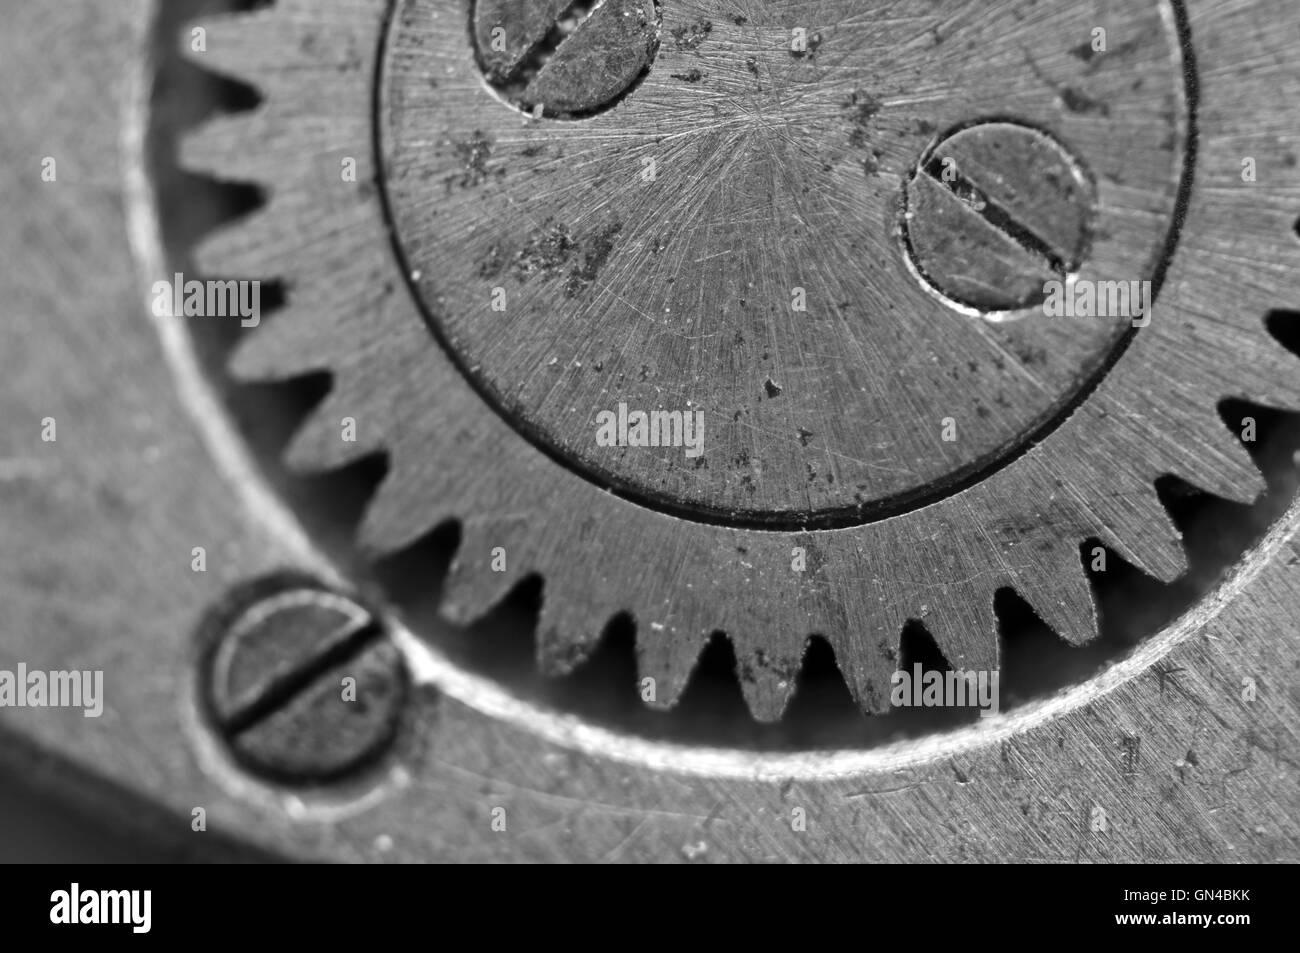 Black and white Metal Cogwheels in Old Clockwork, Macro. Concept Teamwork , Idea Technology - Stock Image